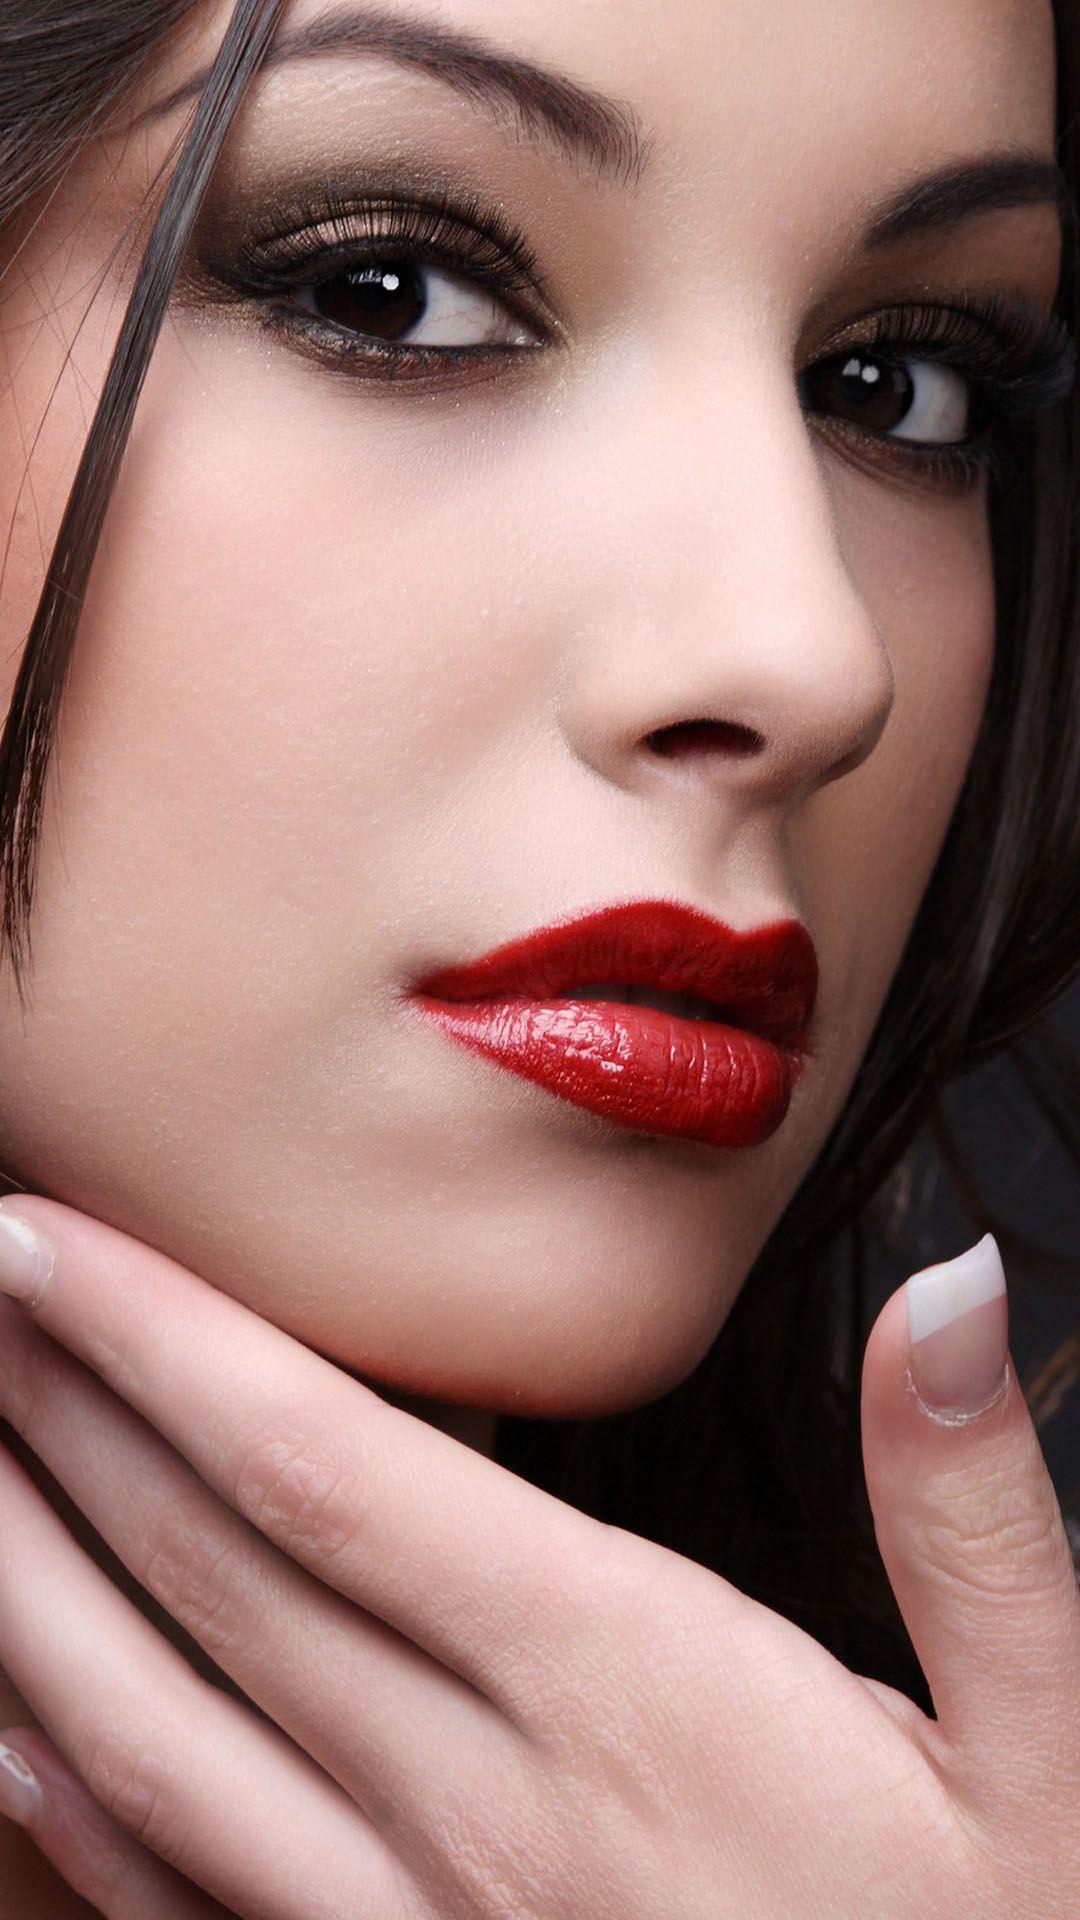 Free download the mac red lipstick portrait wallpaper